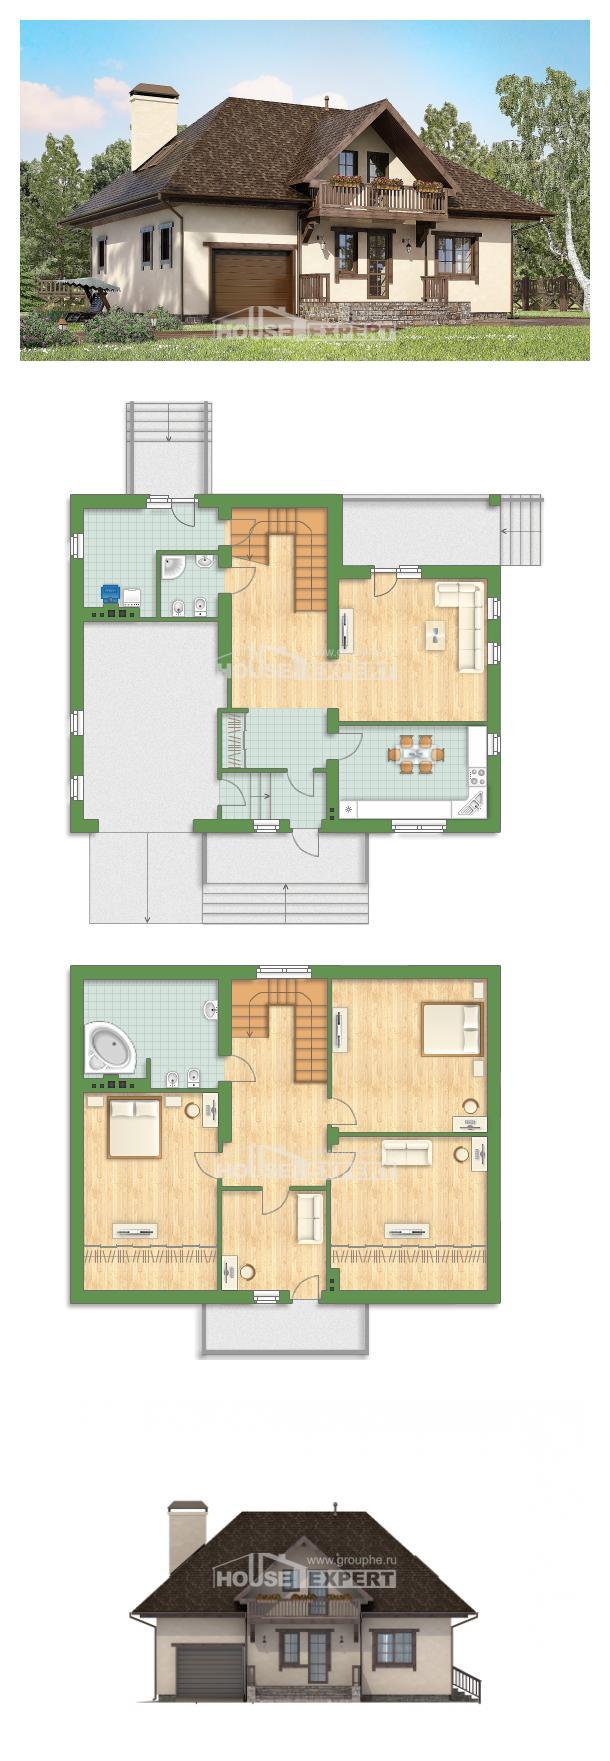 Проект дома 200-001-Л | House Expert